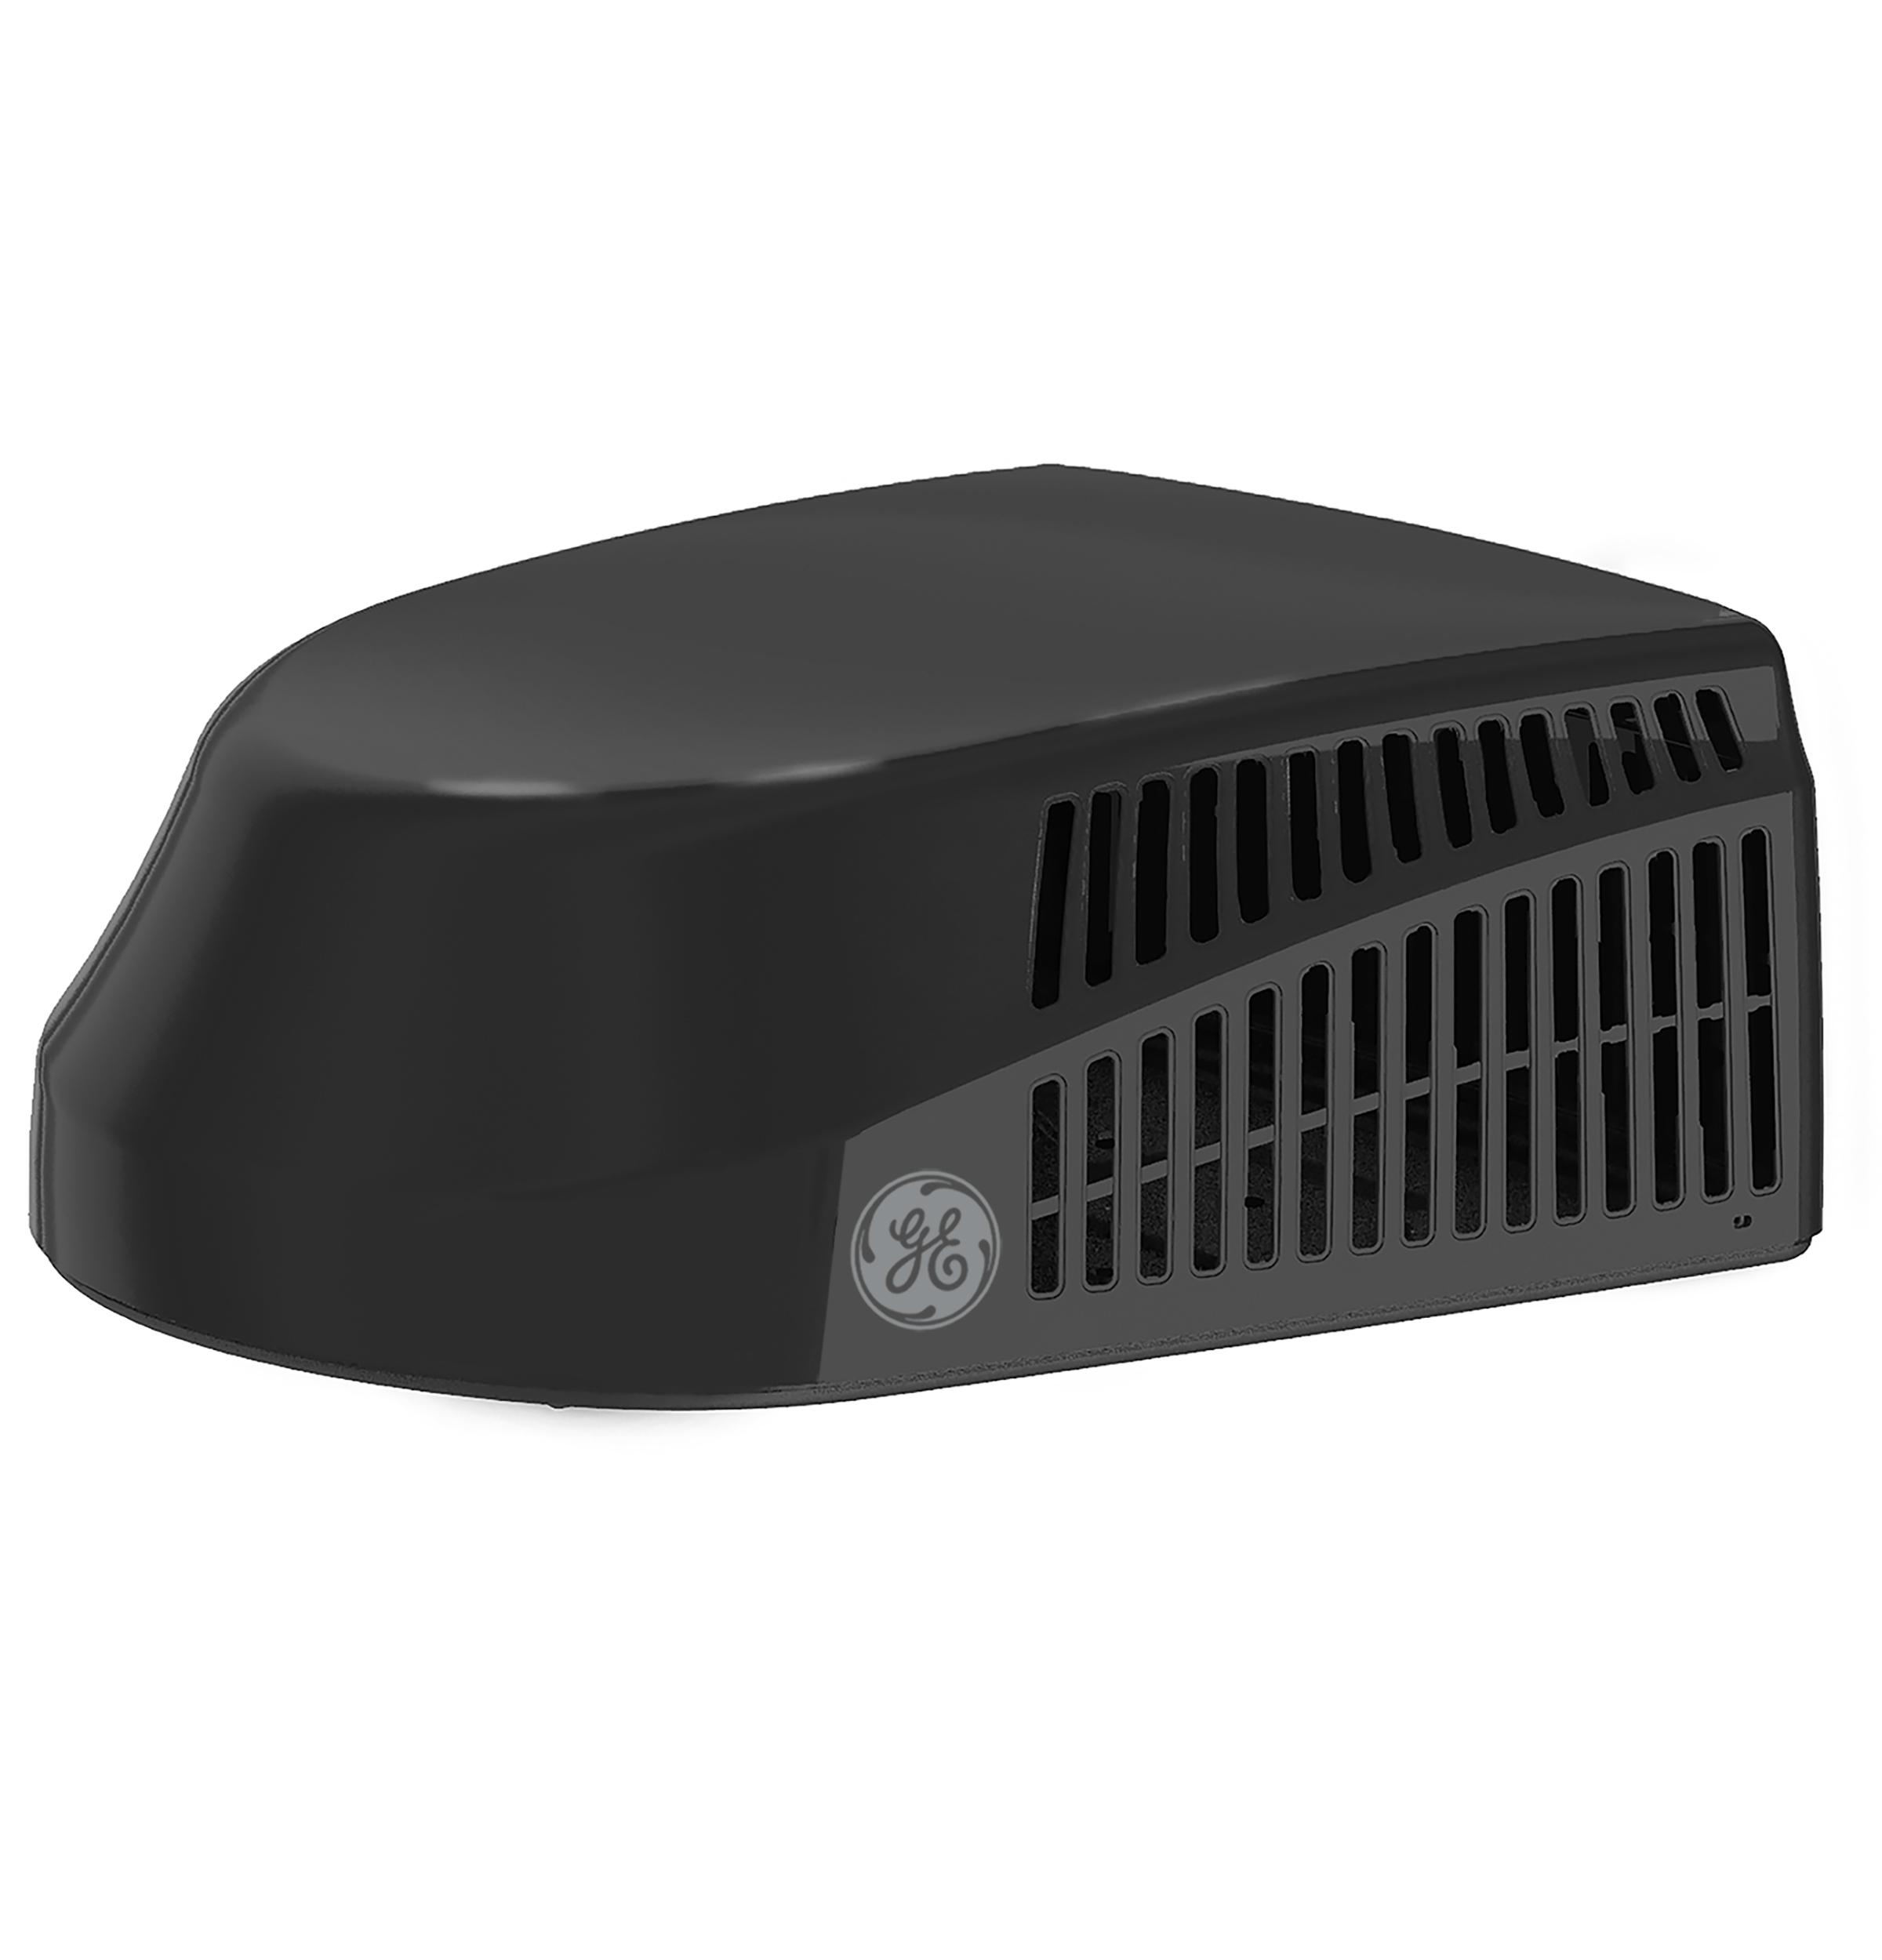 GE Exterior RV Air Conditioner - High Efficiency